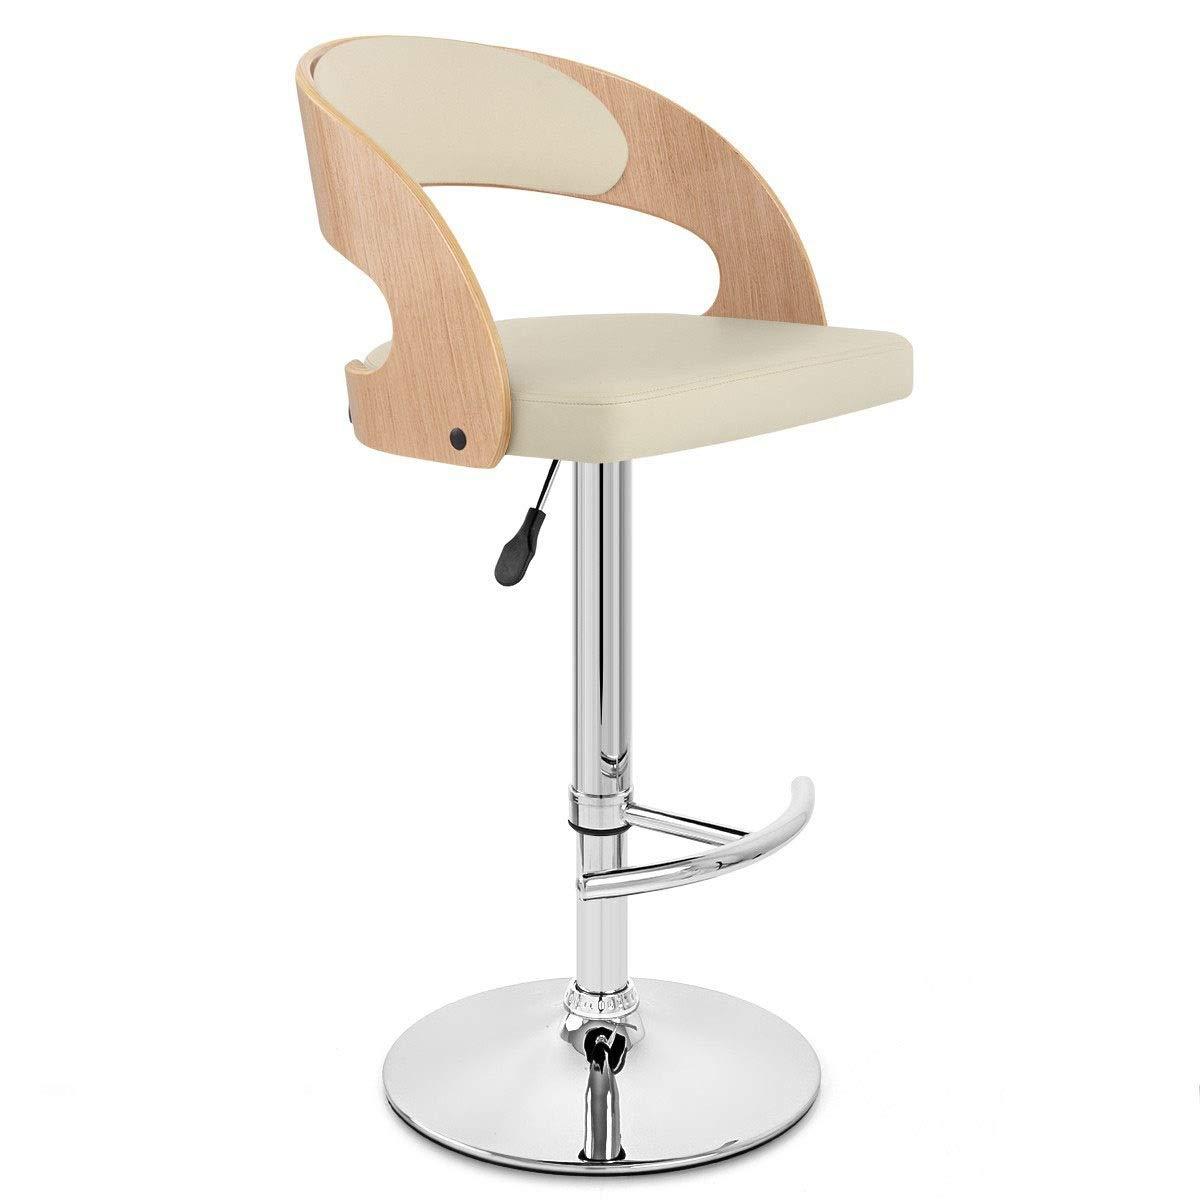 AO-stools Fashion Creative Bar Stool Lift Chair Rotating Bar Chair Solid Wood High Stool 108x41x80cm (Color : White)